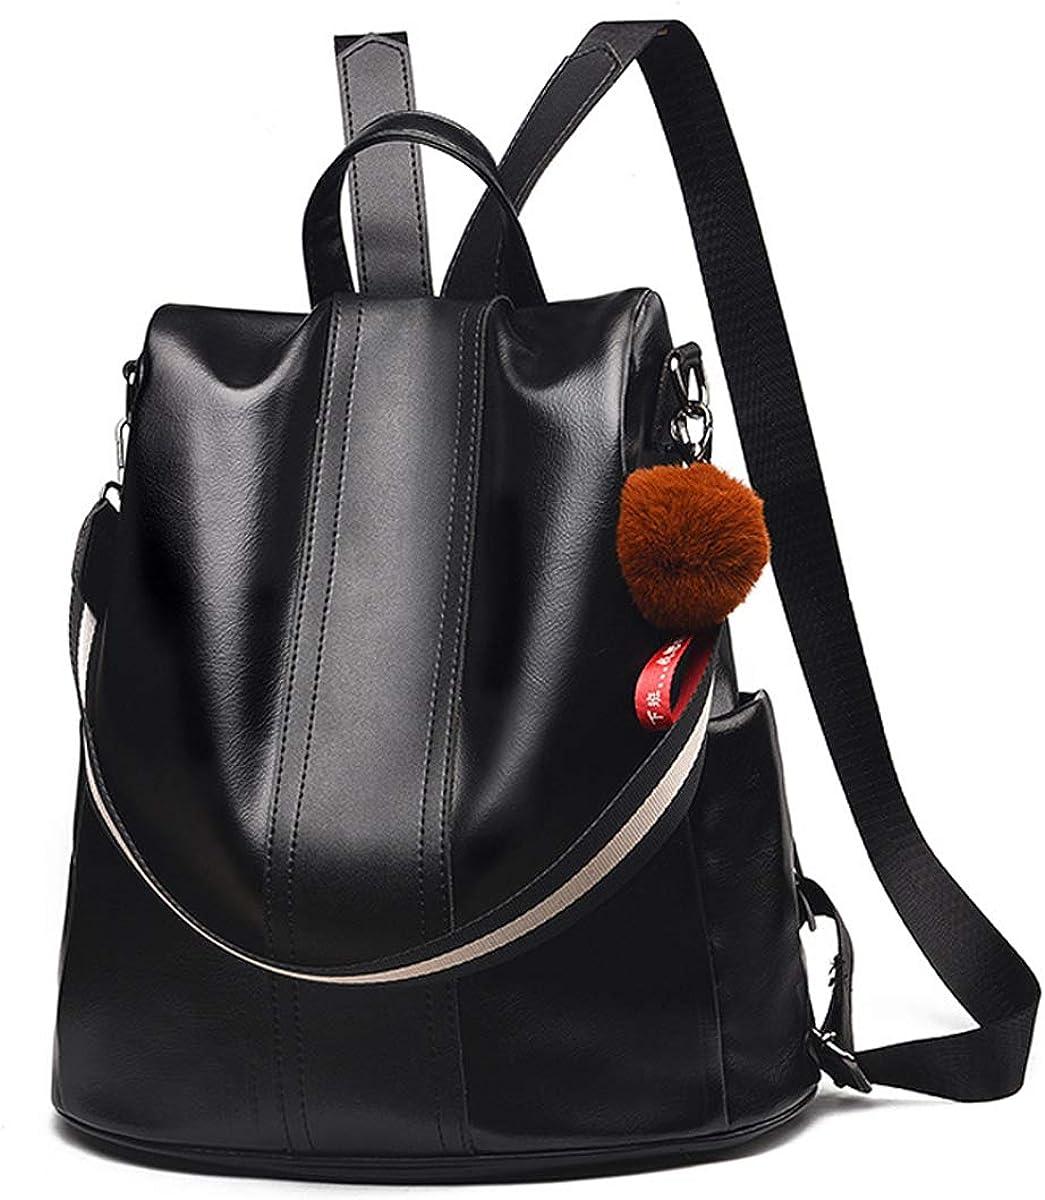 NICOLE DORIS Backpack Women Casual rucksack Waterproof Fashion Backpack